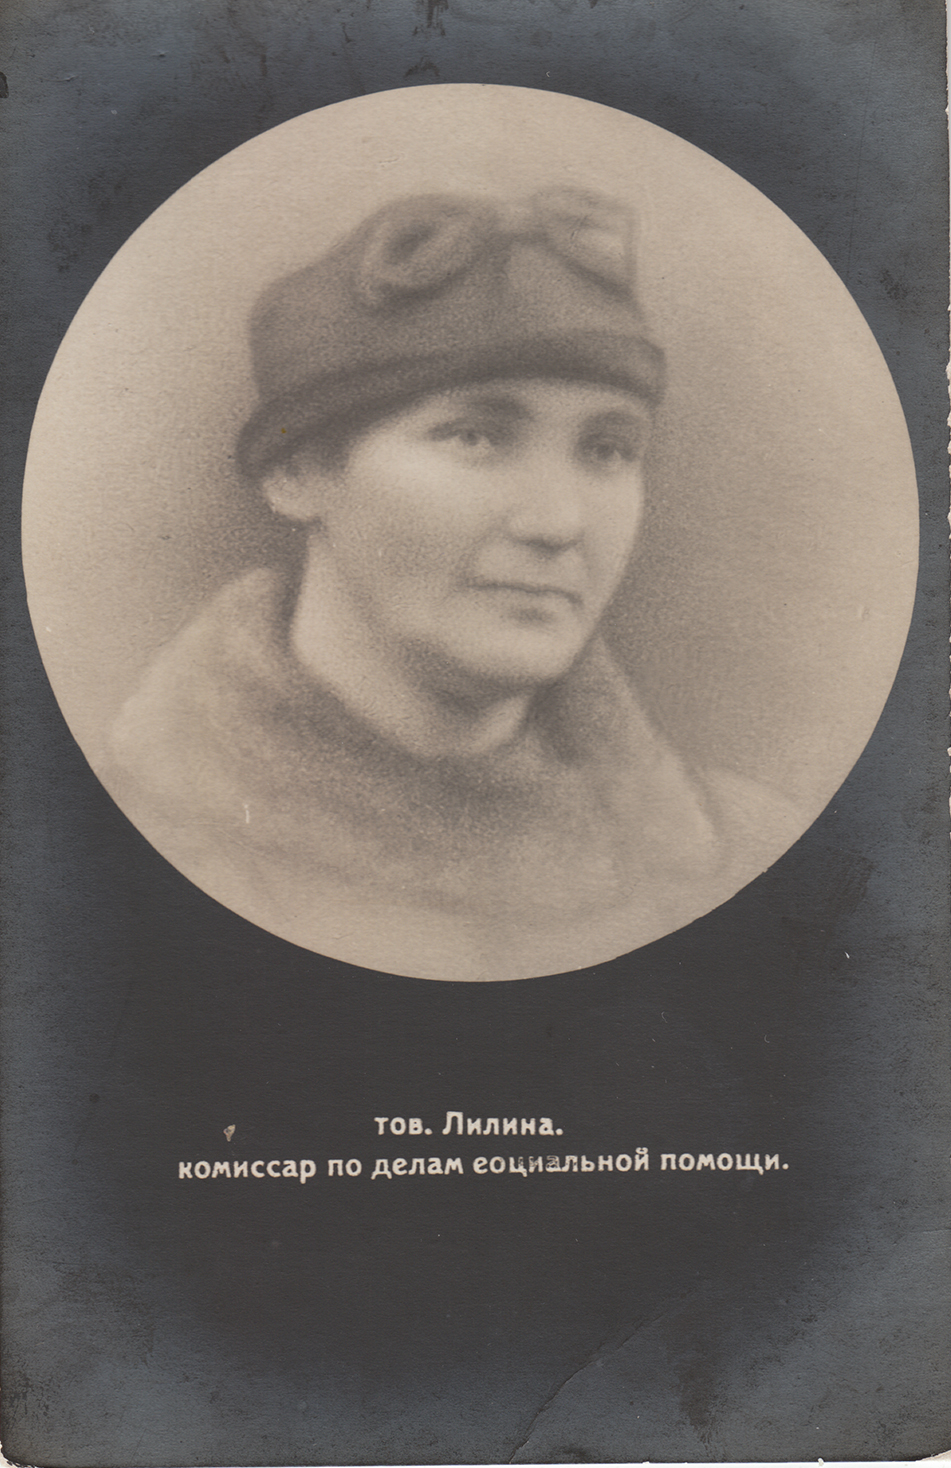 RUS_00449_001